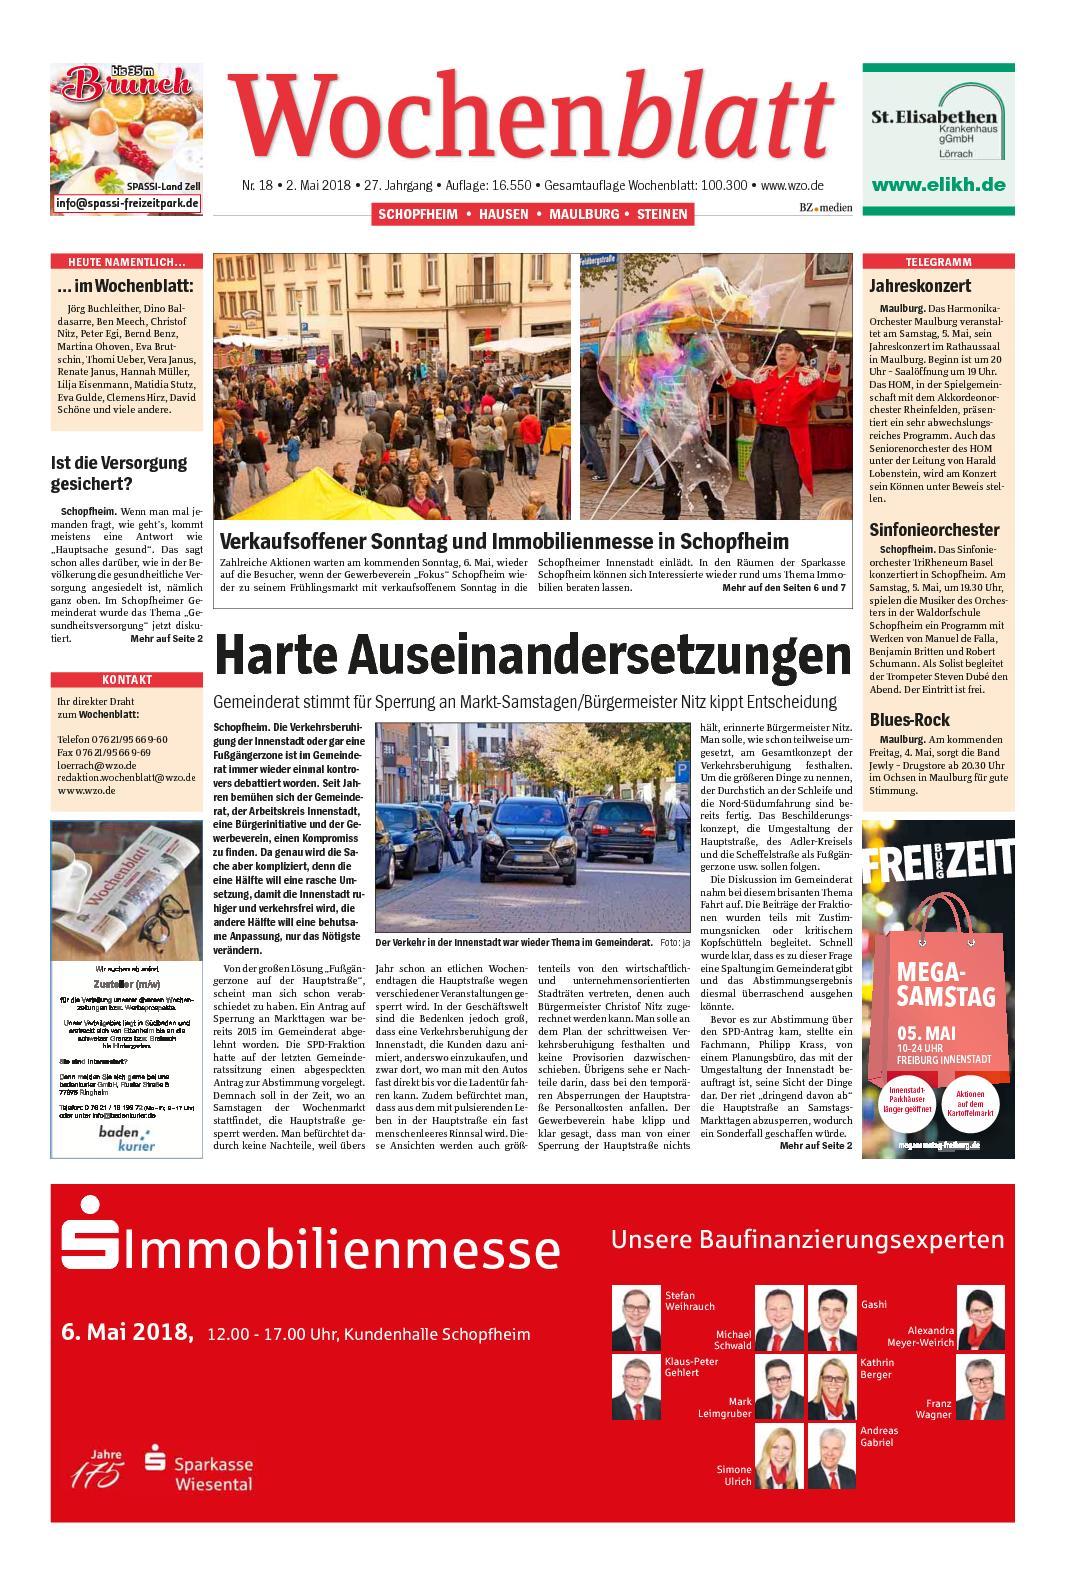 Calaméo Calaméo Schopfheim Calaméo Schopfheim Wochenblatt Calaméo Wochenblatt Wochenblatt Wochenblatt Schopfheim HI29EeWDbY